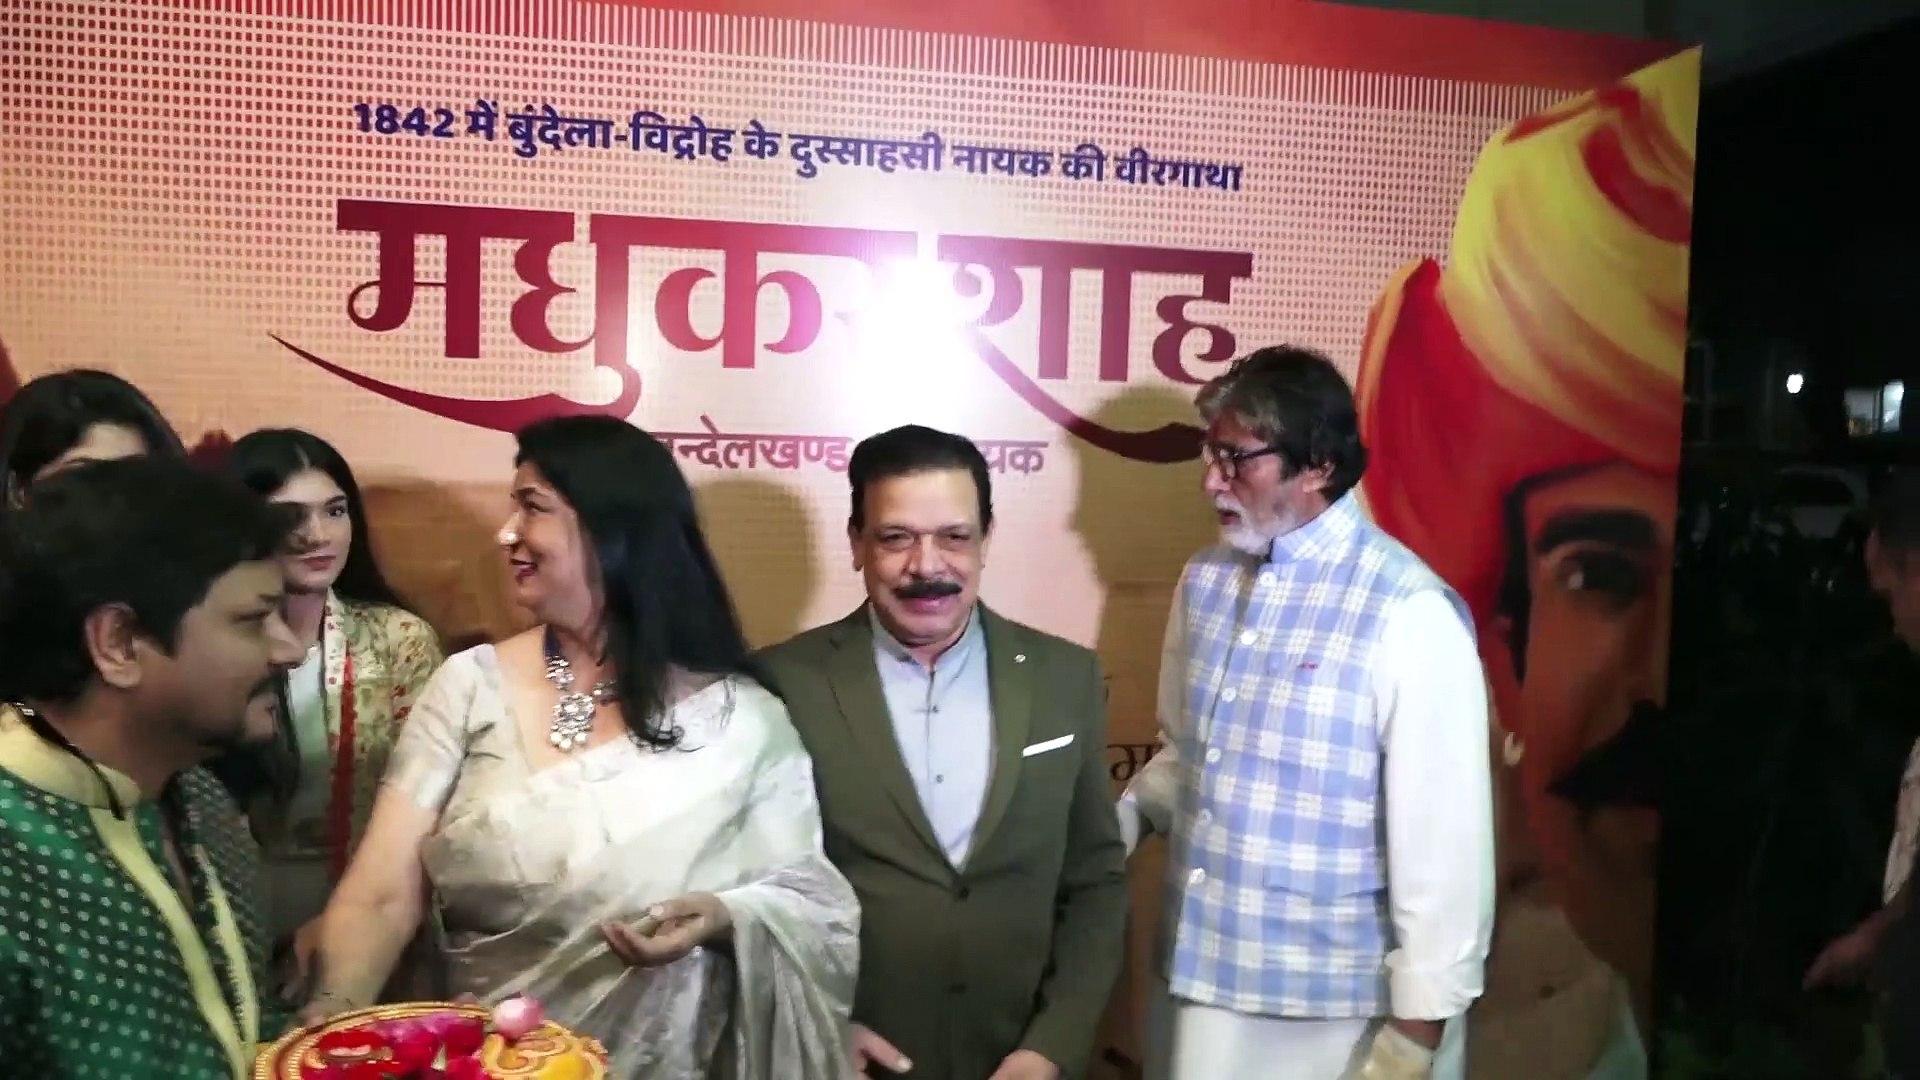 Amitabh Bachchan Launch Book Madhukar Shah Bundela written by Govind Namdev